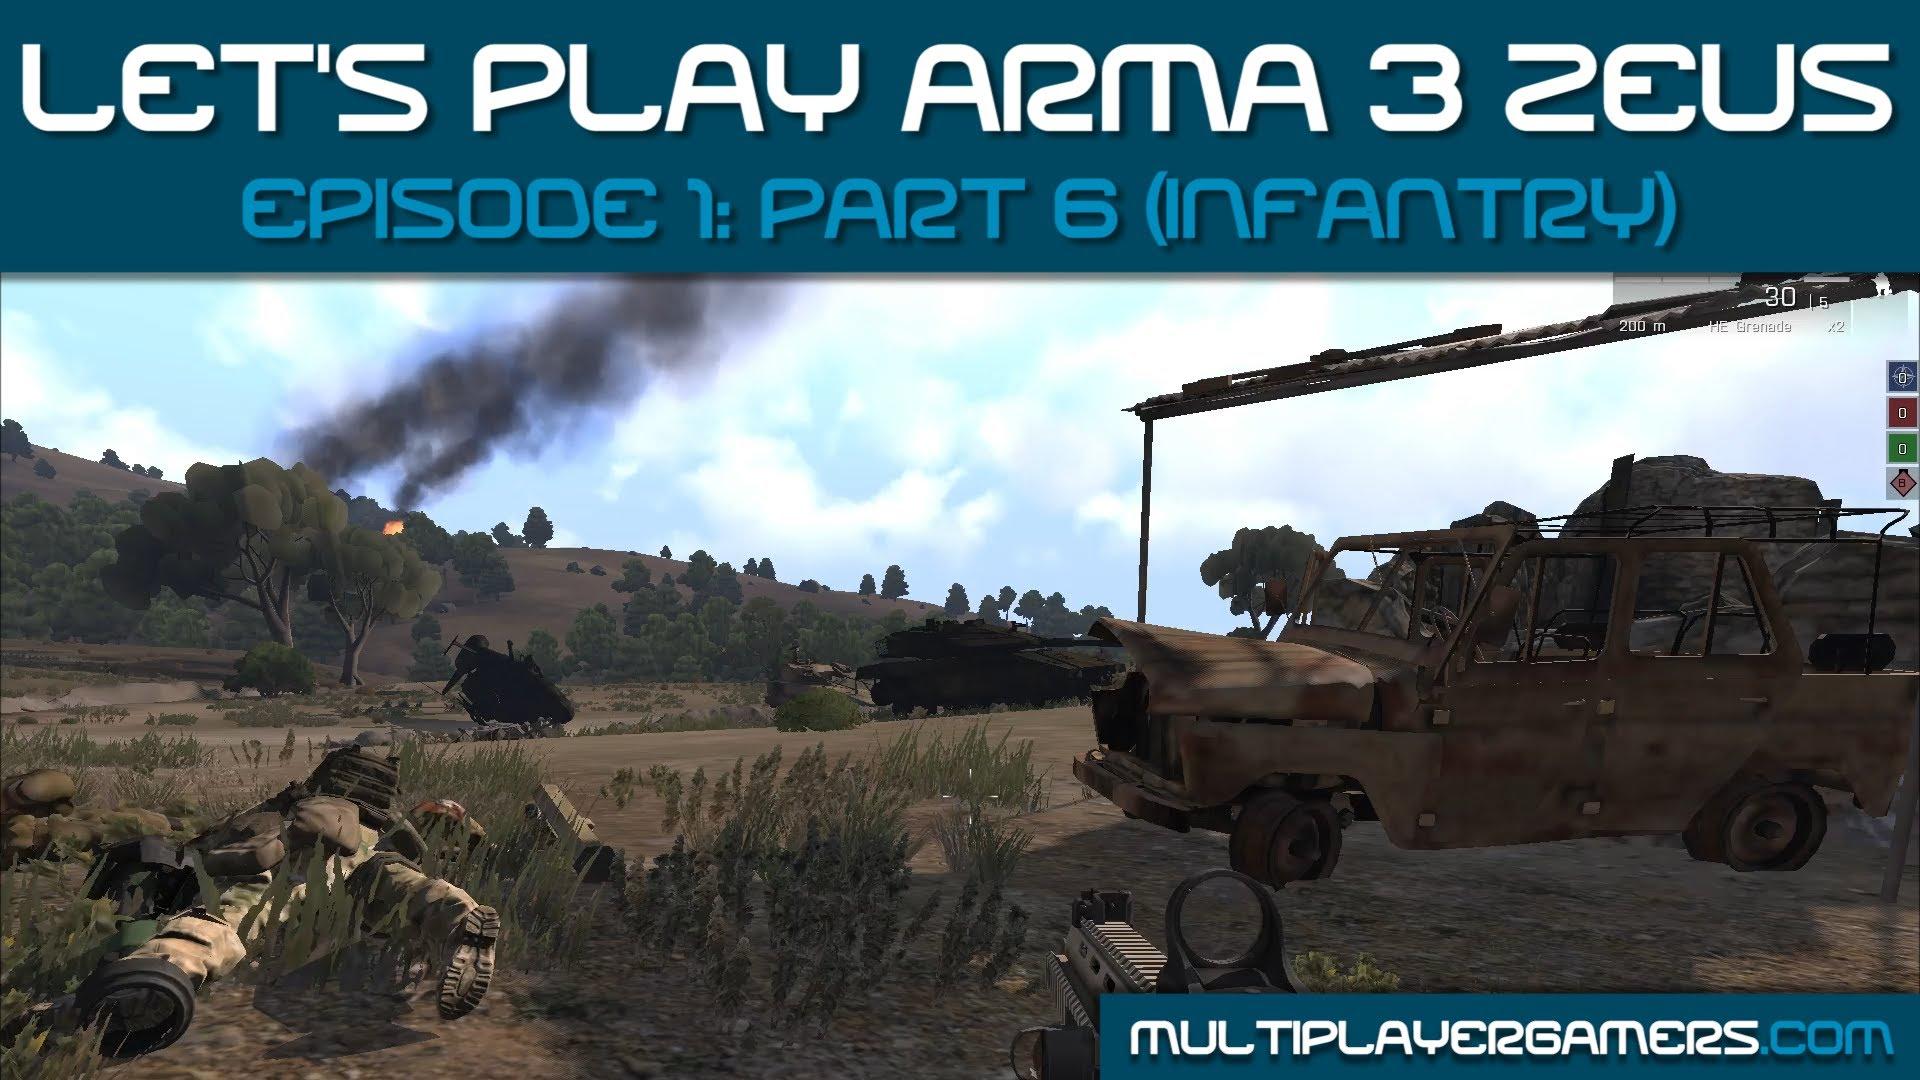 MG's Arma3 Zeus: Ep 1 Pt 6 (Infantry View)